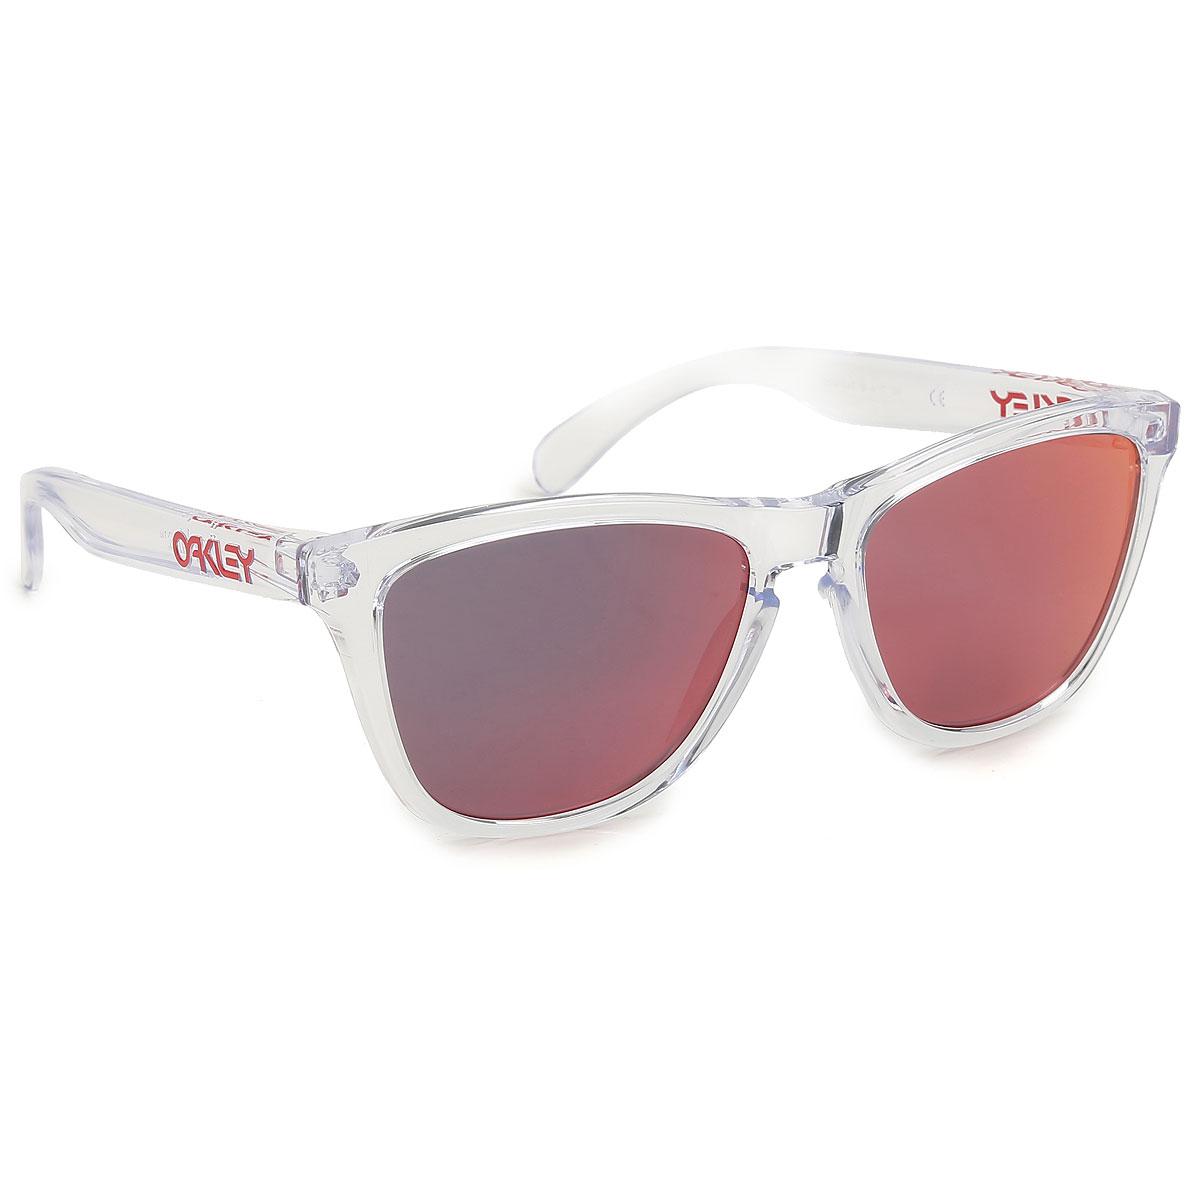 Oakley Sunglasses On Sale, Crystal, 2019